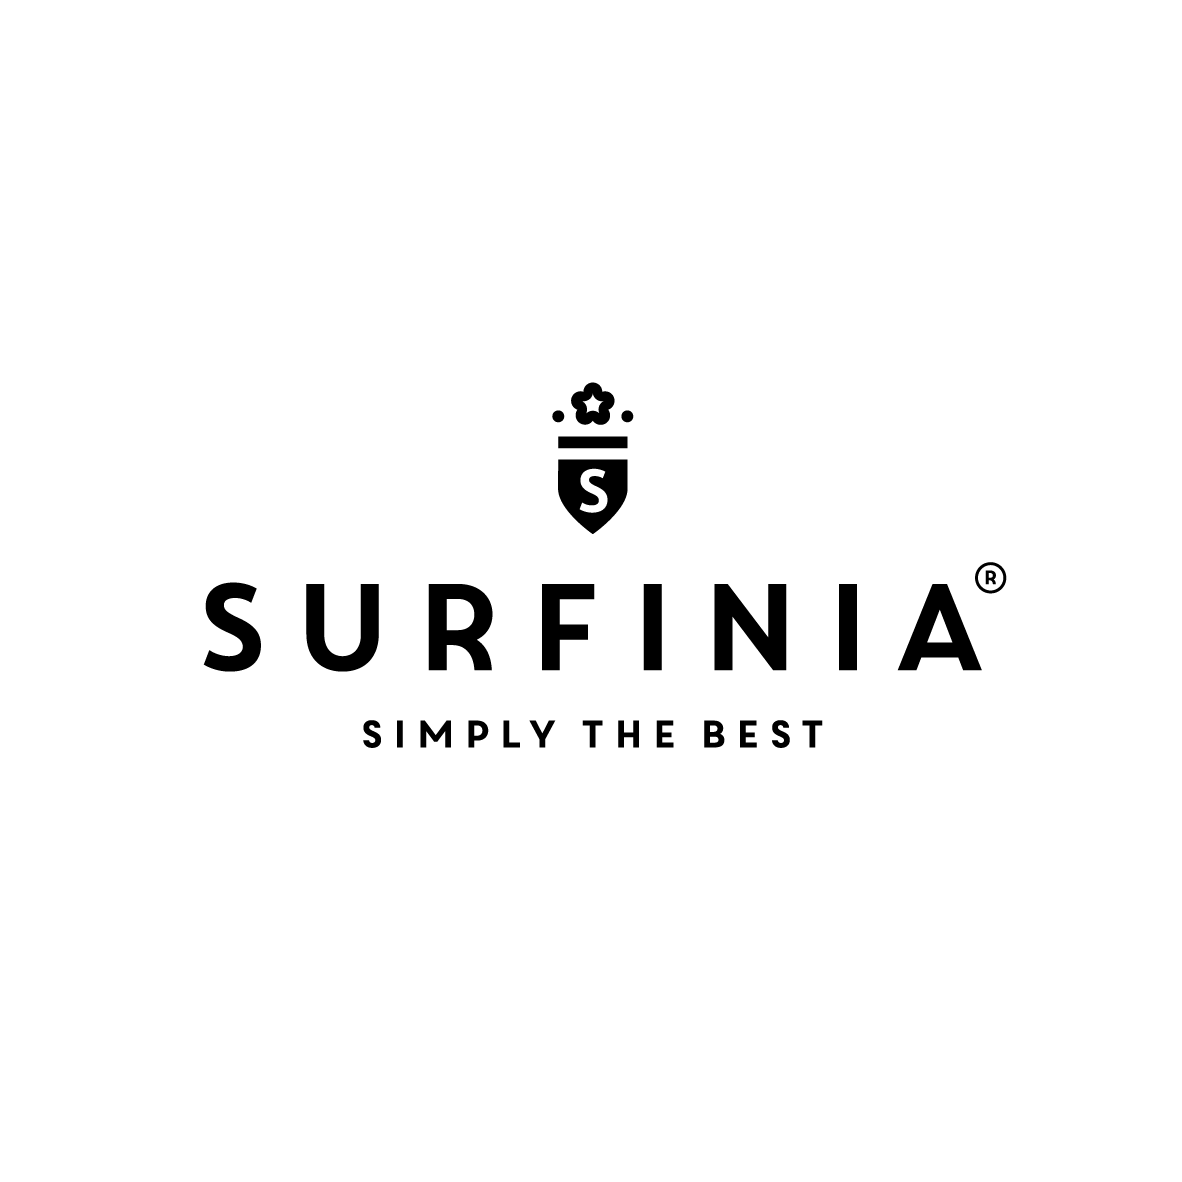 Surfinia®